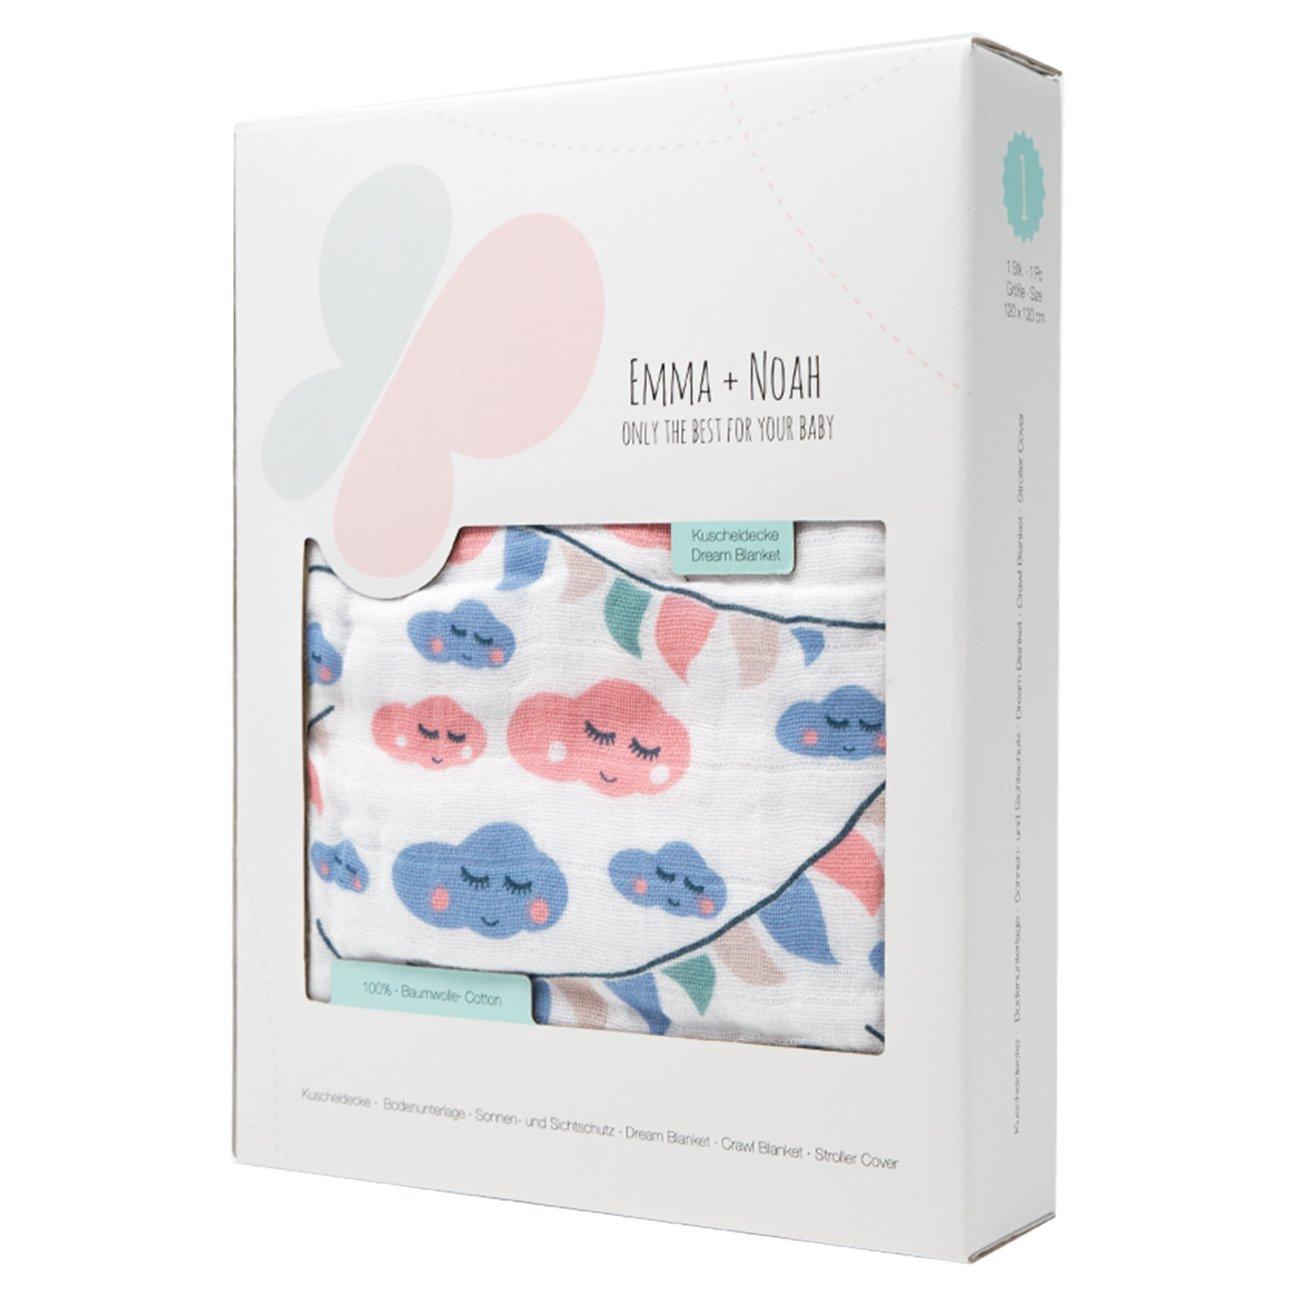 100/% Pure Cotton extra soft Colour: Blue Emma /& Noah Baby Blanket Boy 120x120 cm 4-Layered